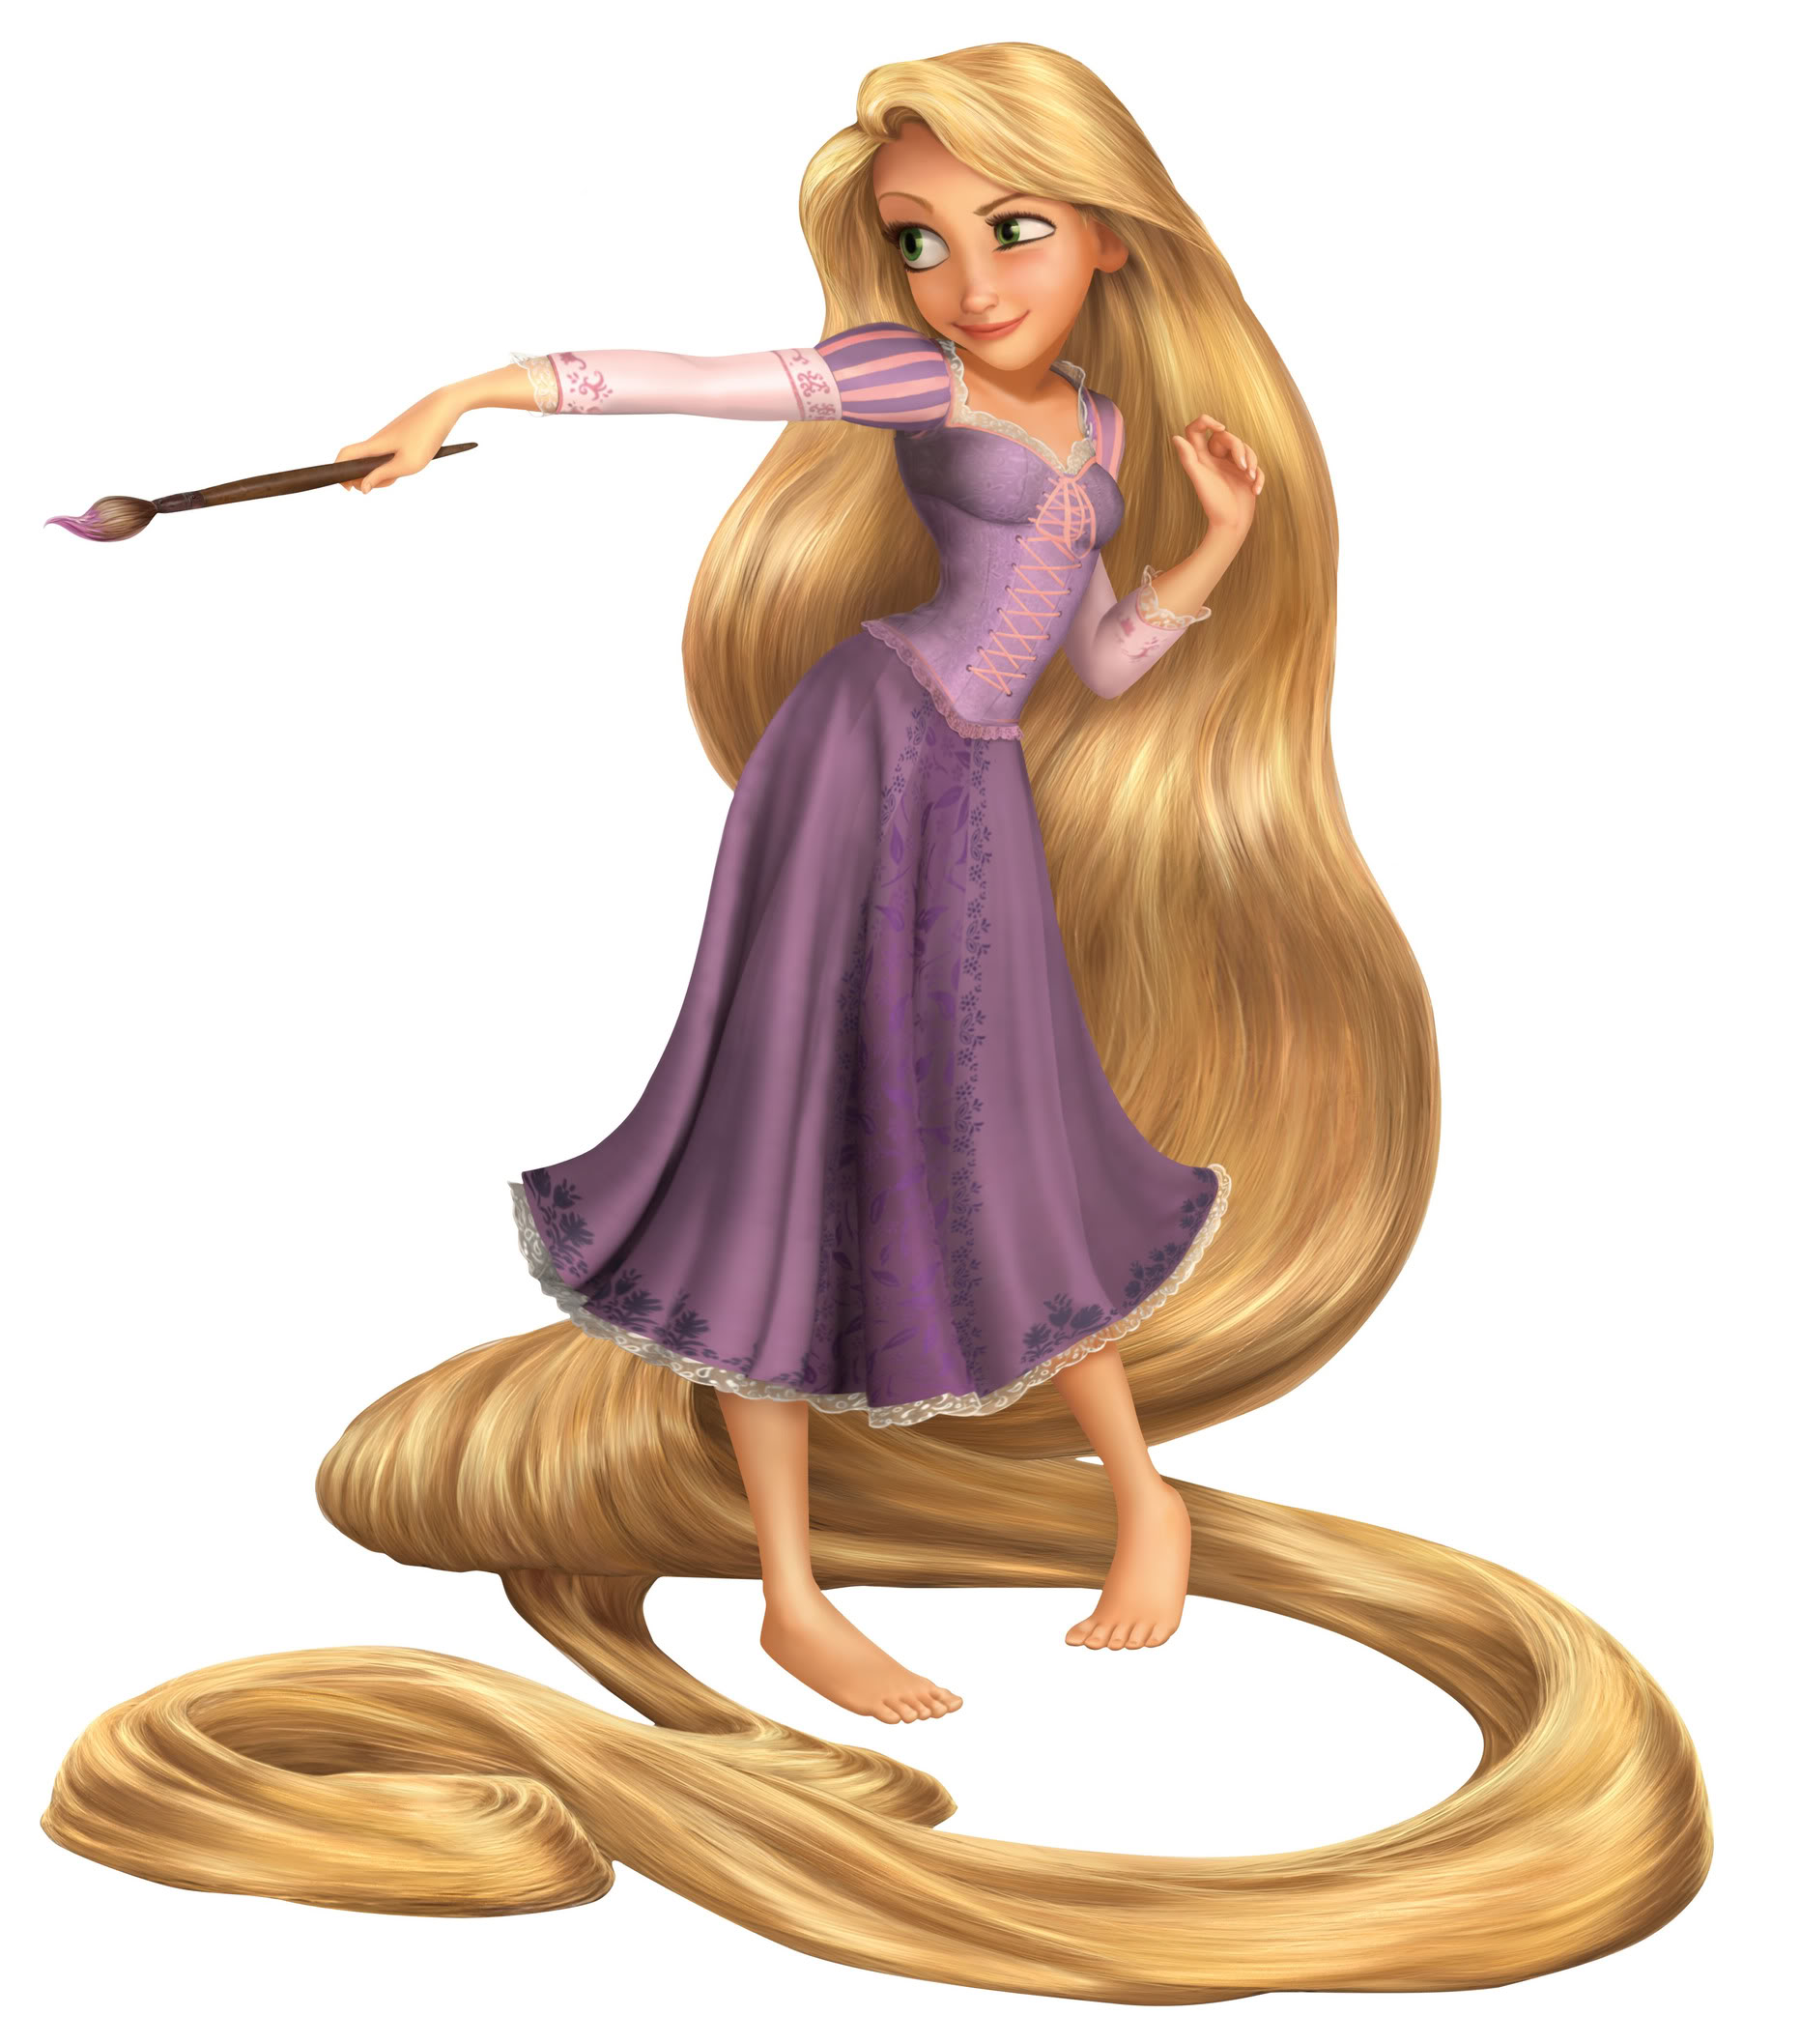 Rapunzelpainting  Rapunzelpaintin...